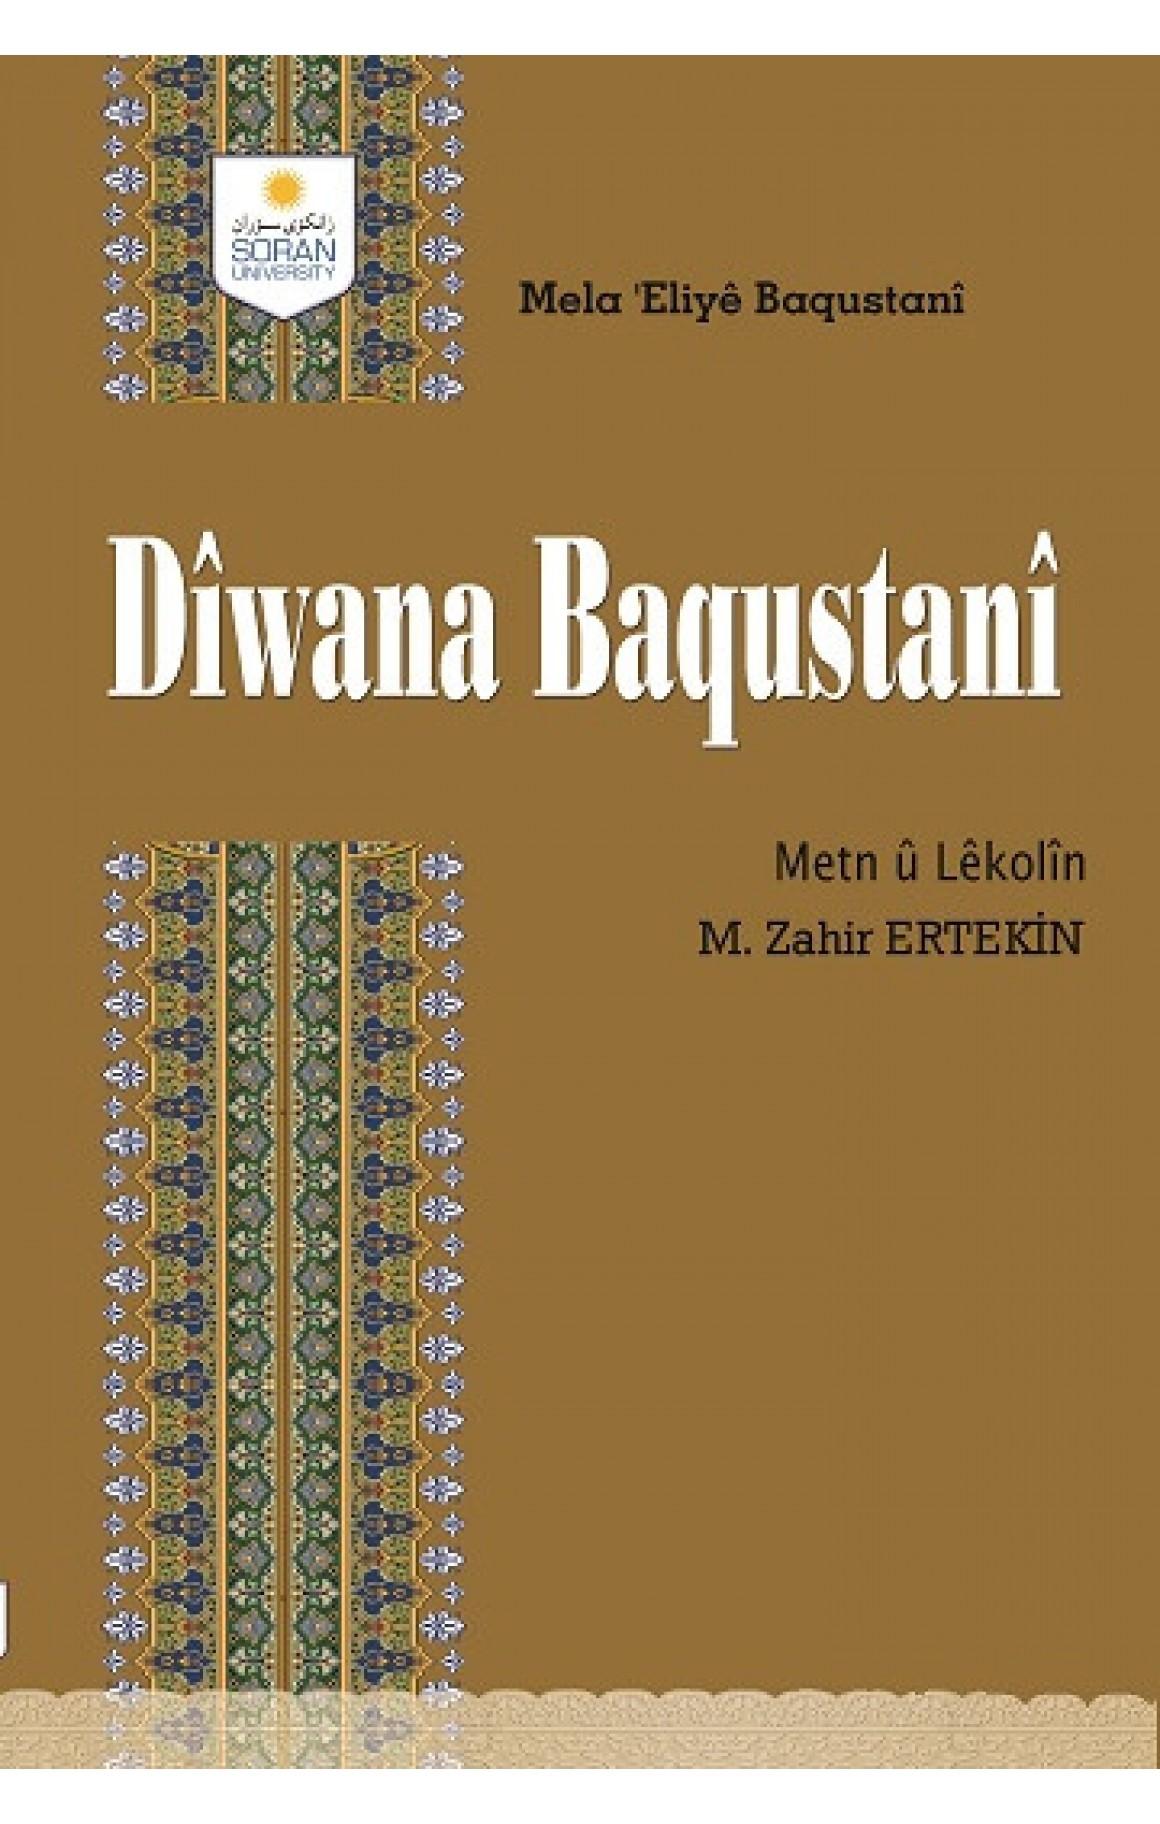 Dîwana Baqustanî